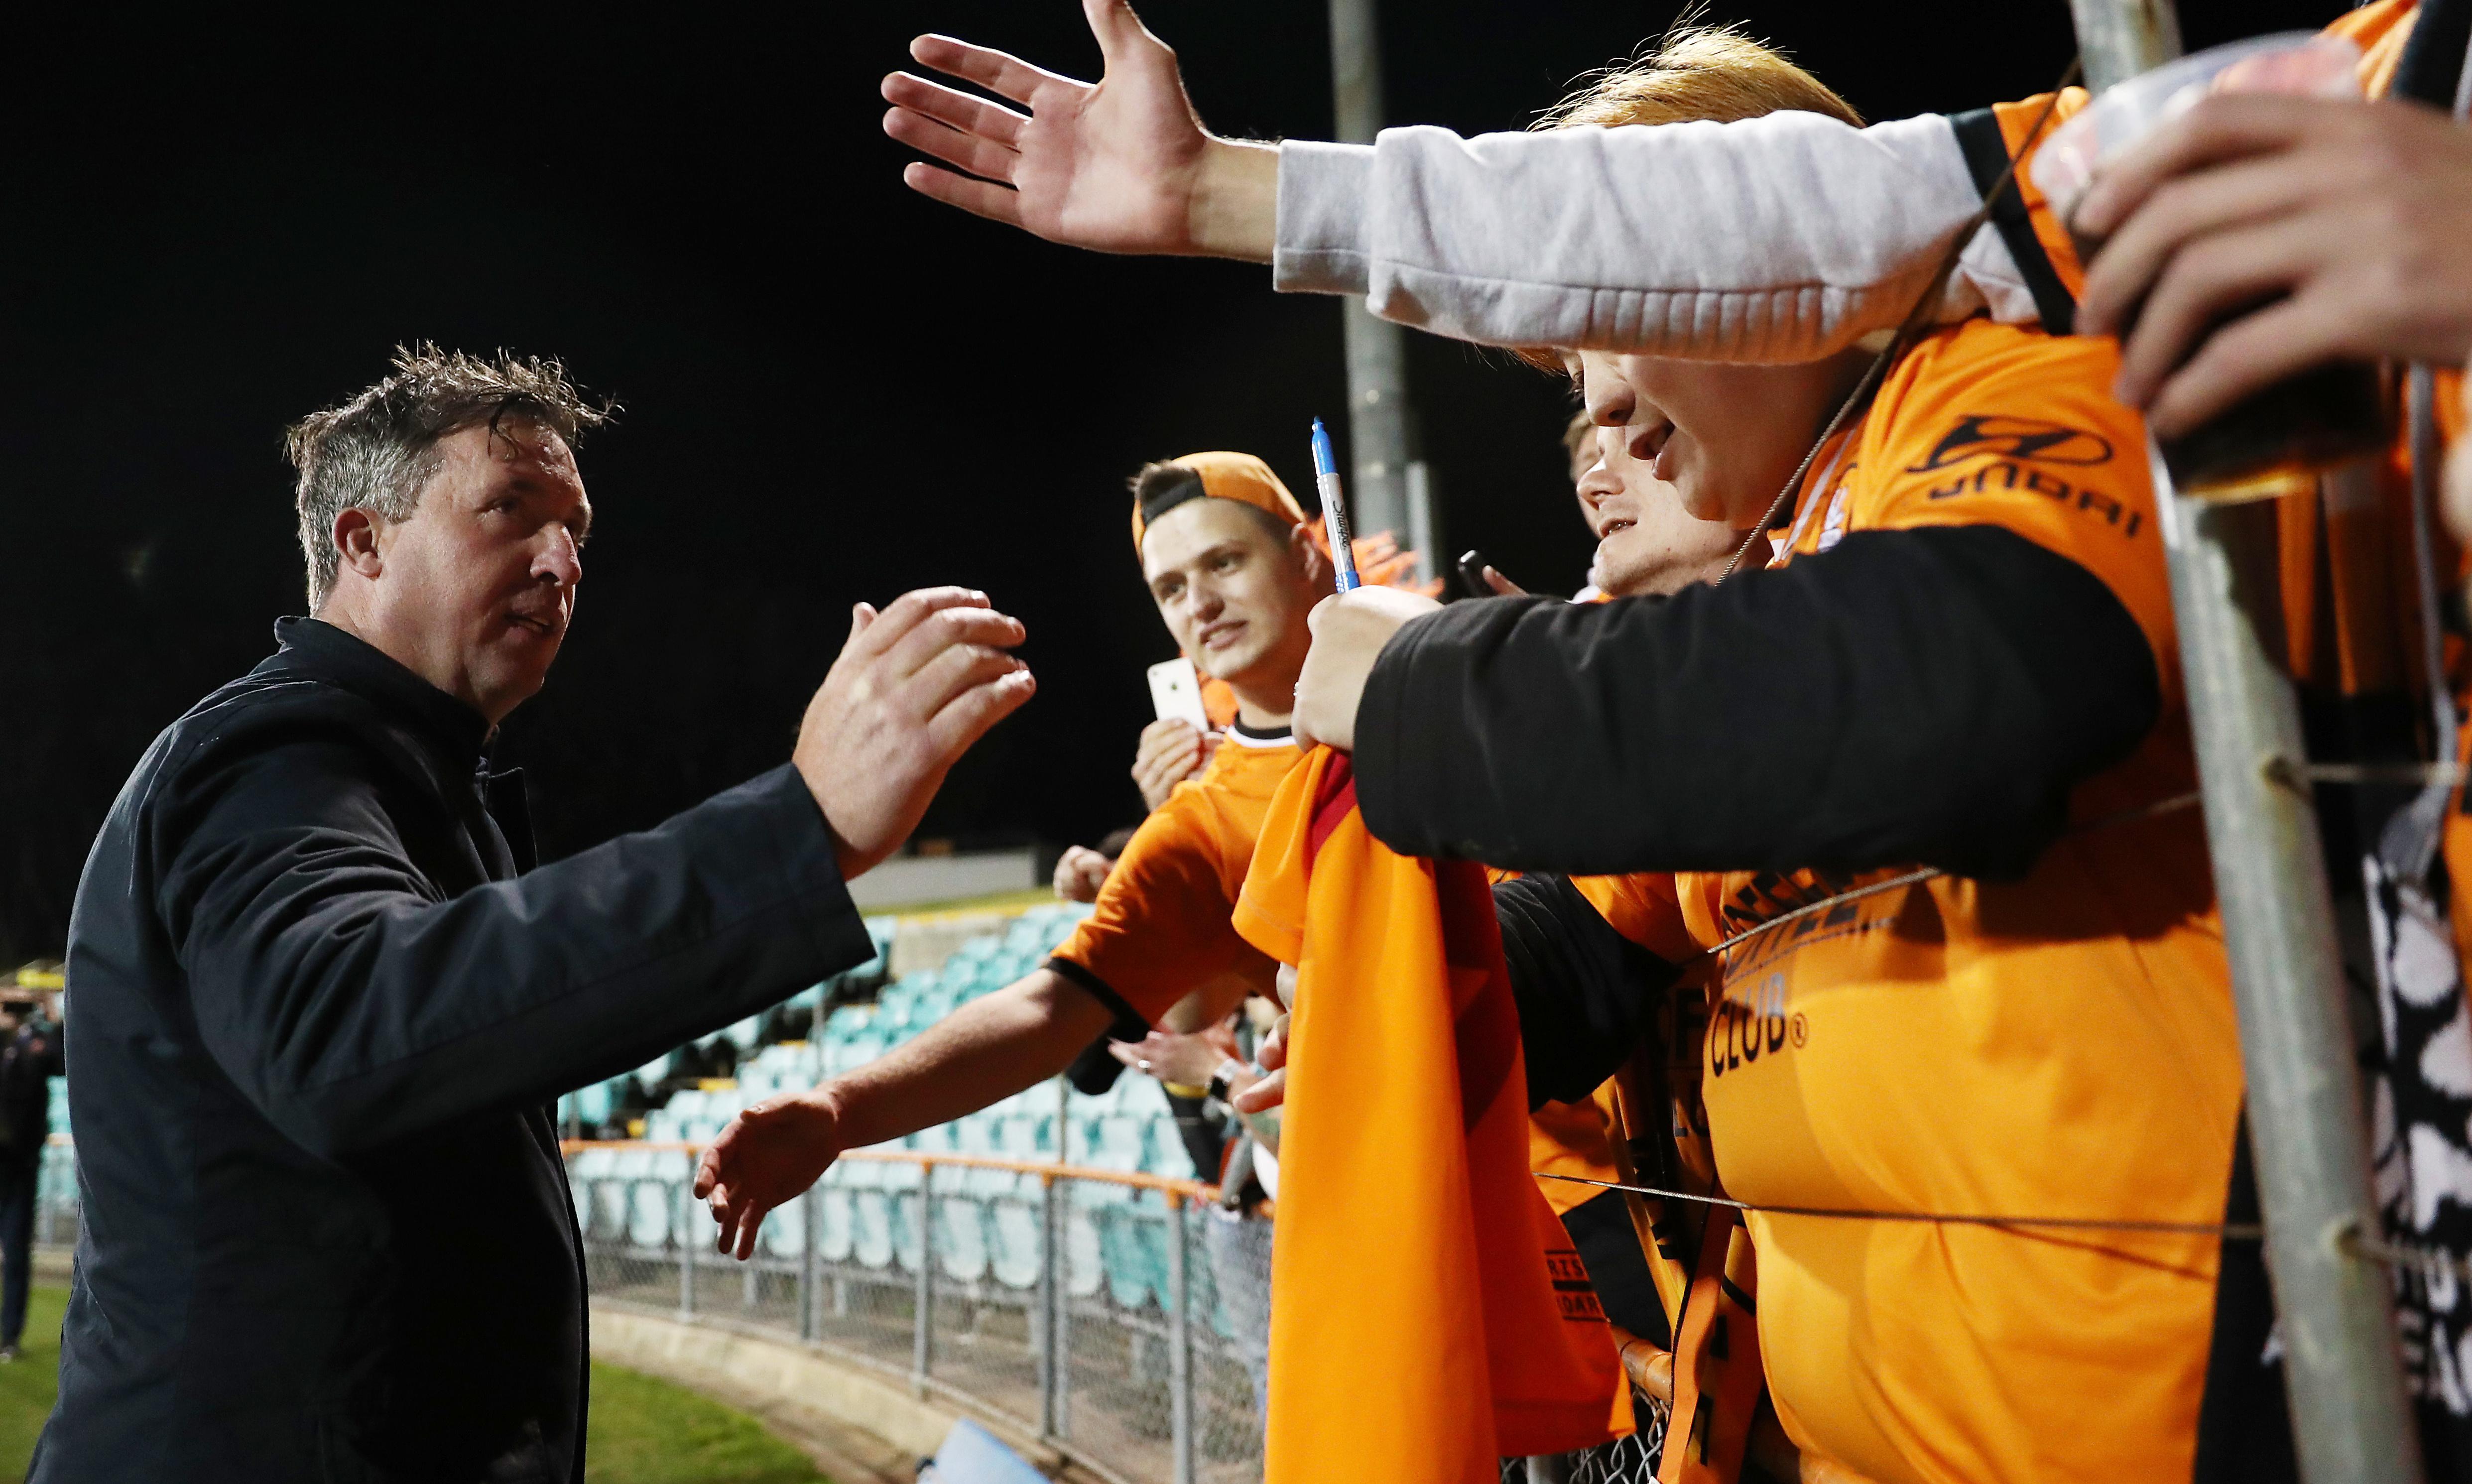 'An epic achievement': Robbie Fowler's coaching debut ends in shock FFA Cup win